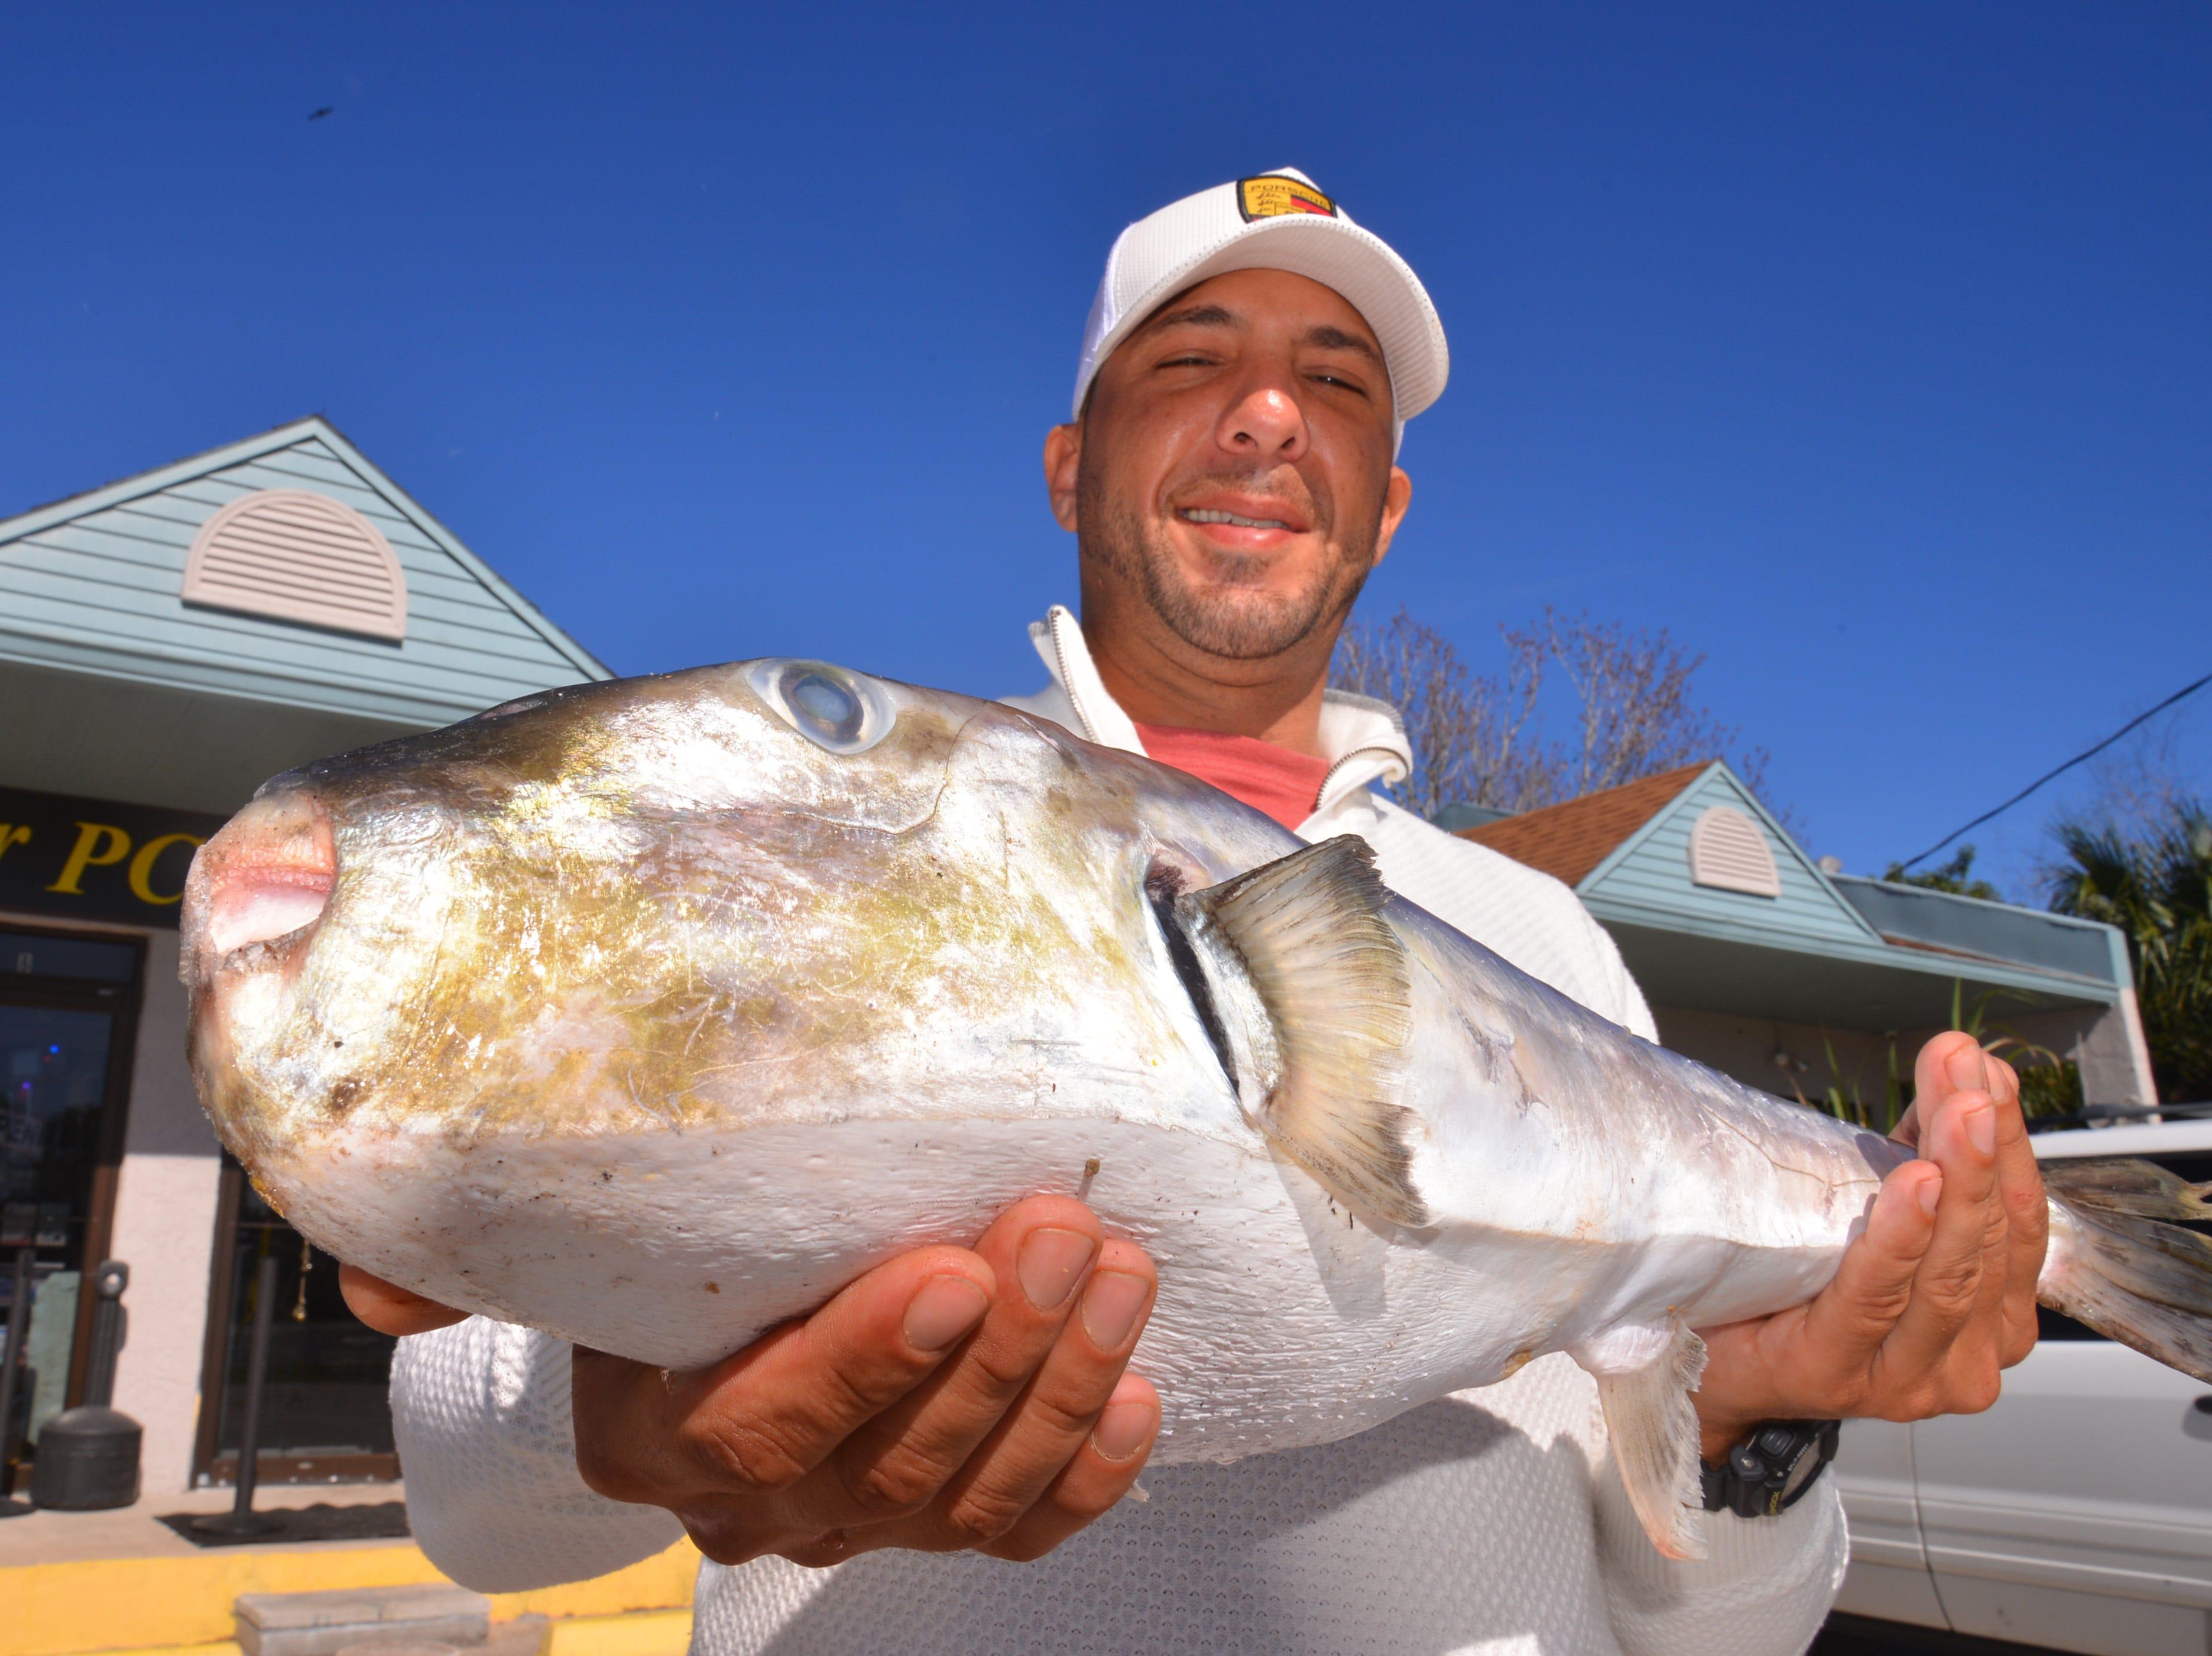 Monster puffer fish! Angler hooks potential world record-breaker off Port Canaveral